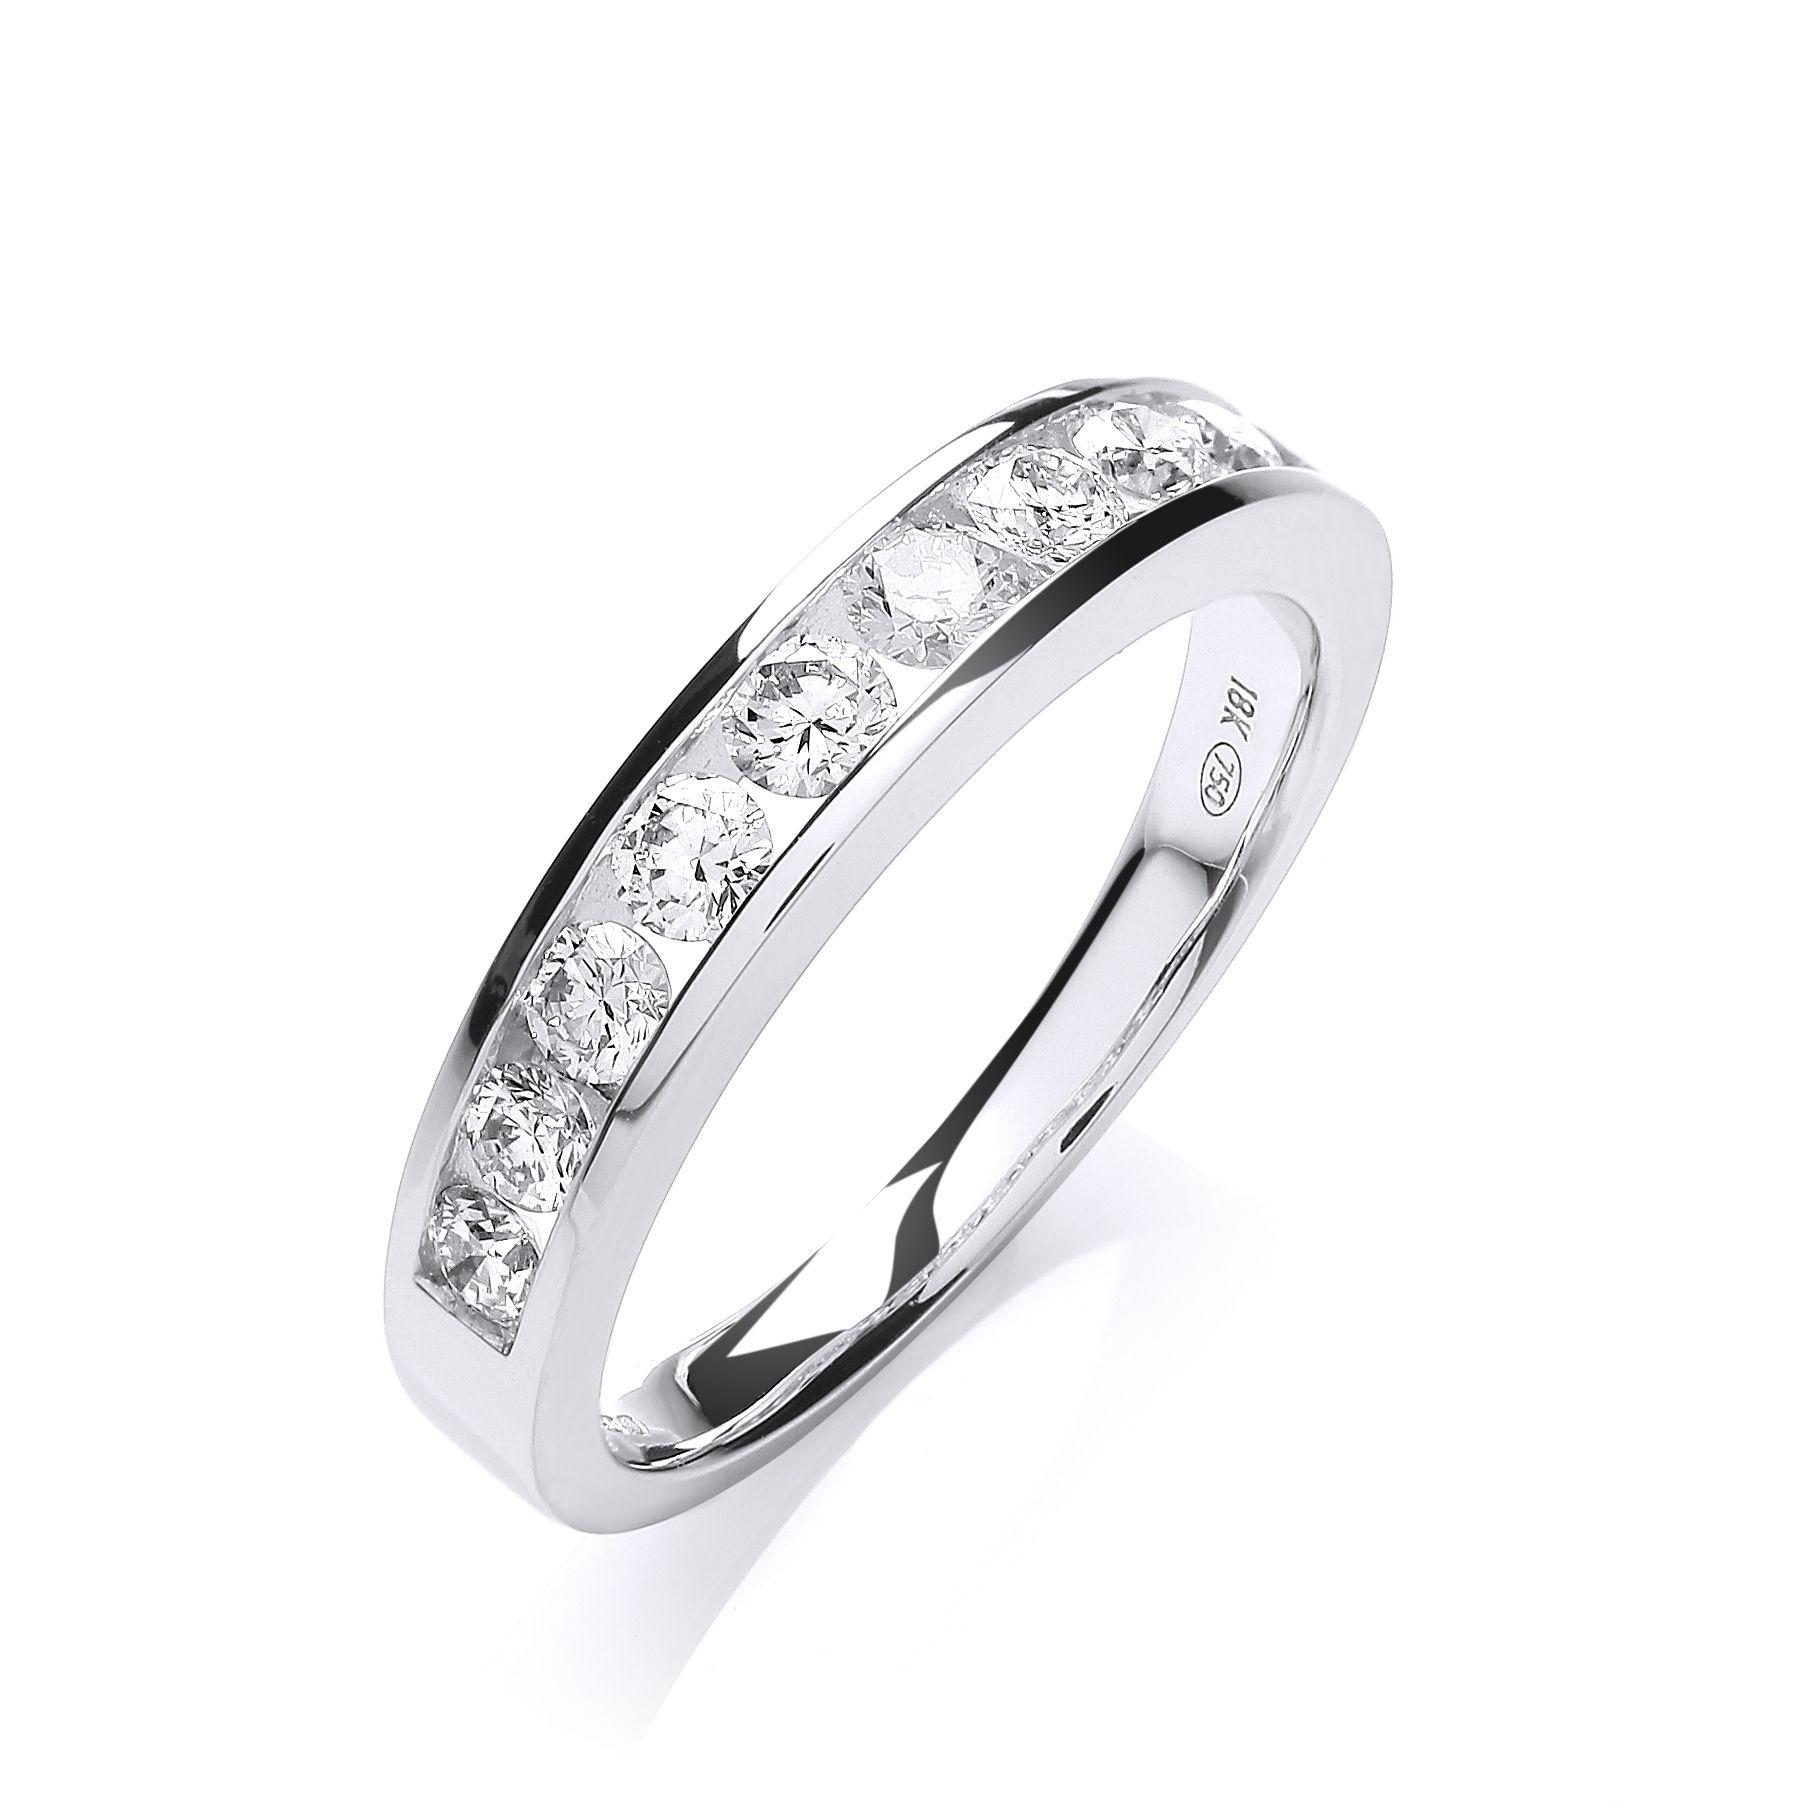 Wearnes jewellers Half Diamond Eternity Ring